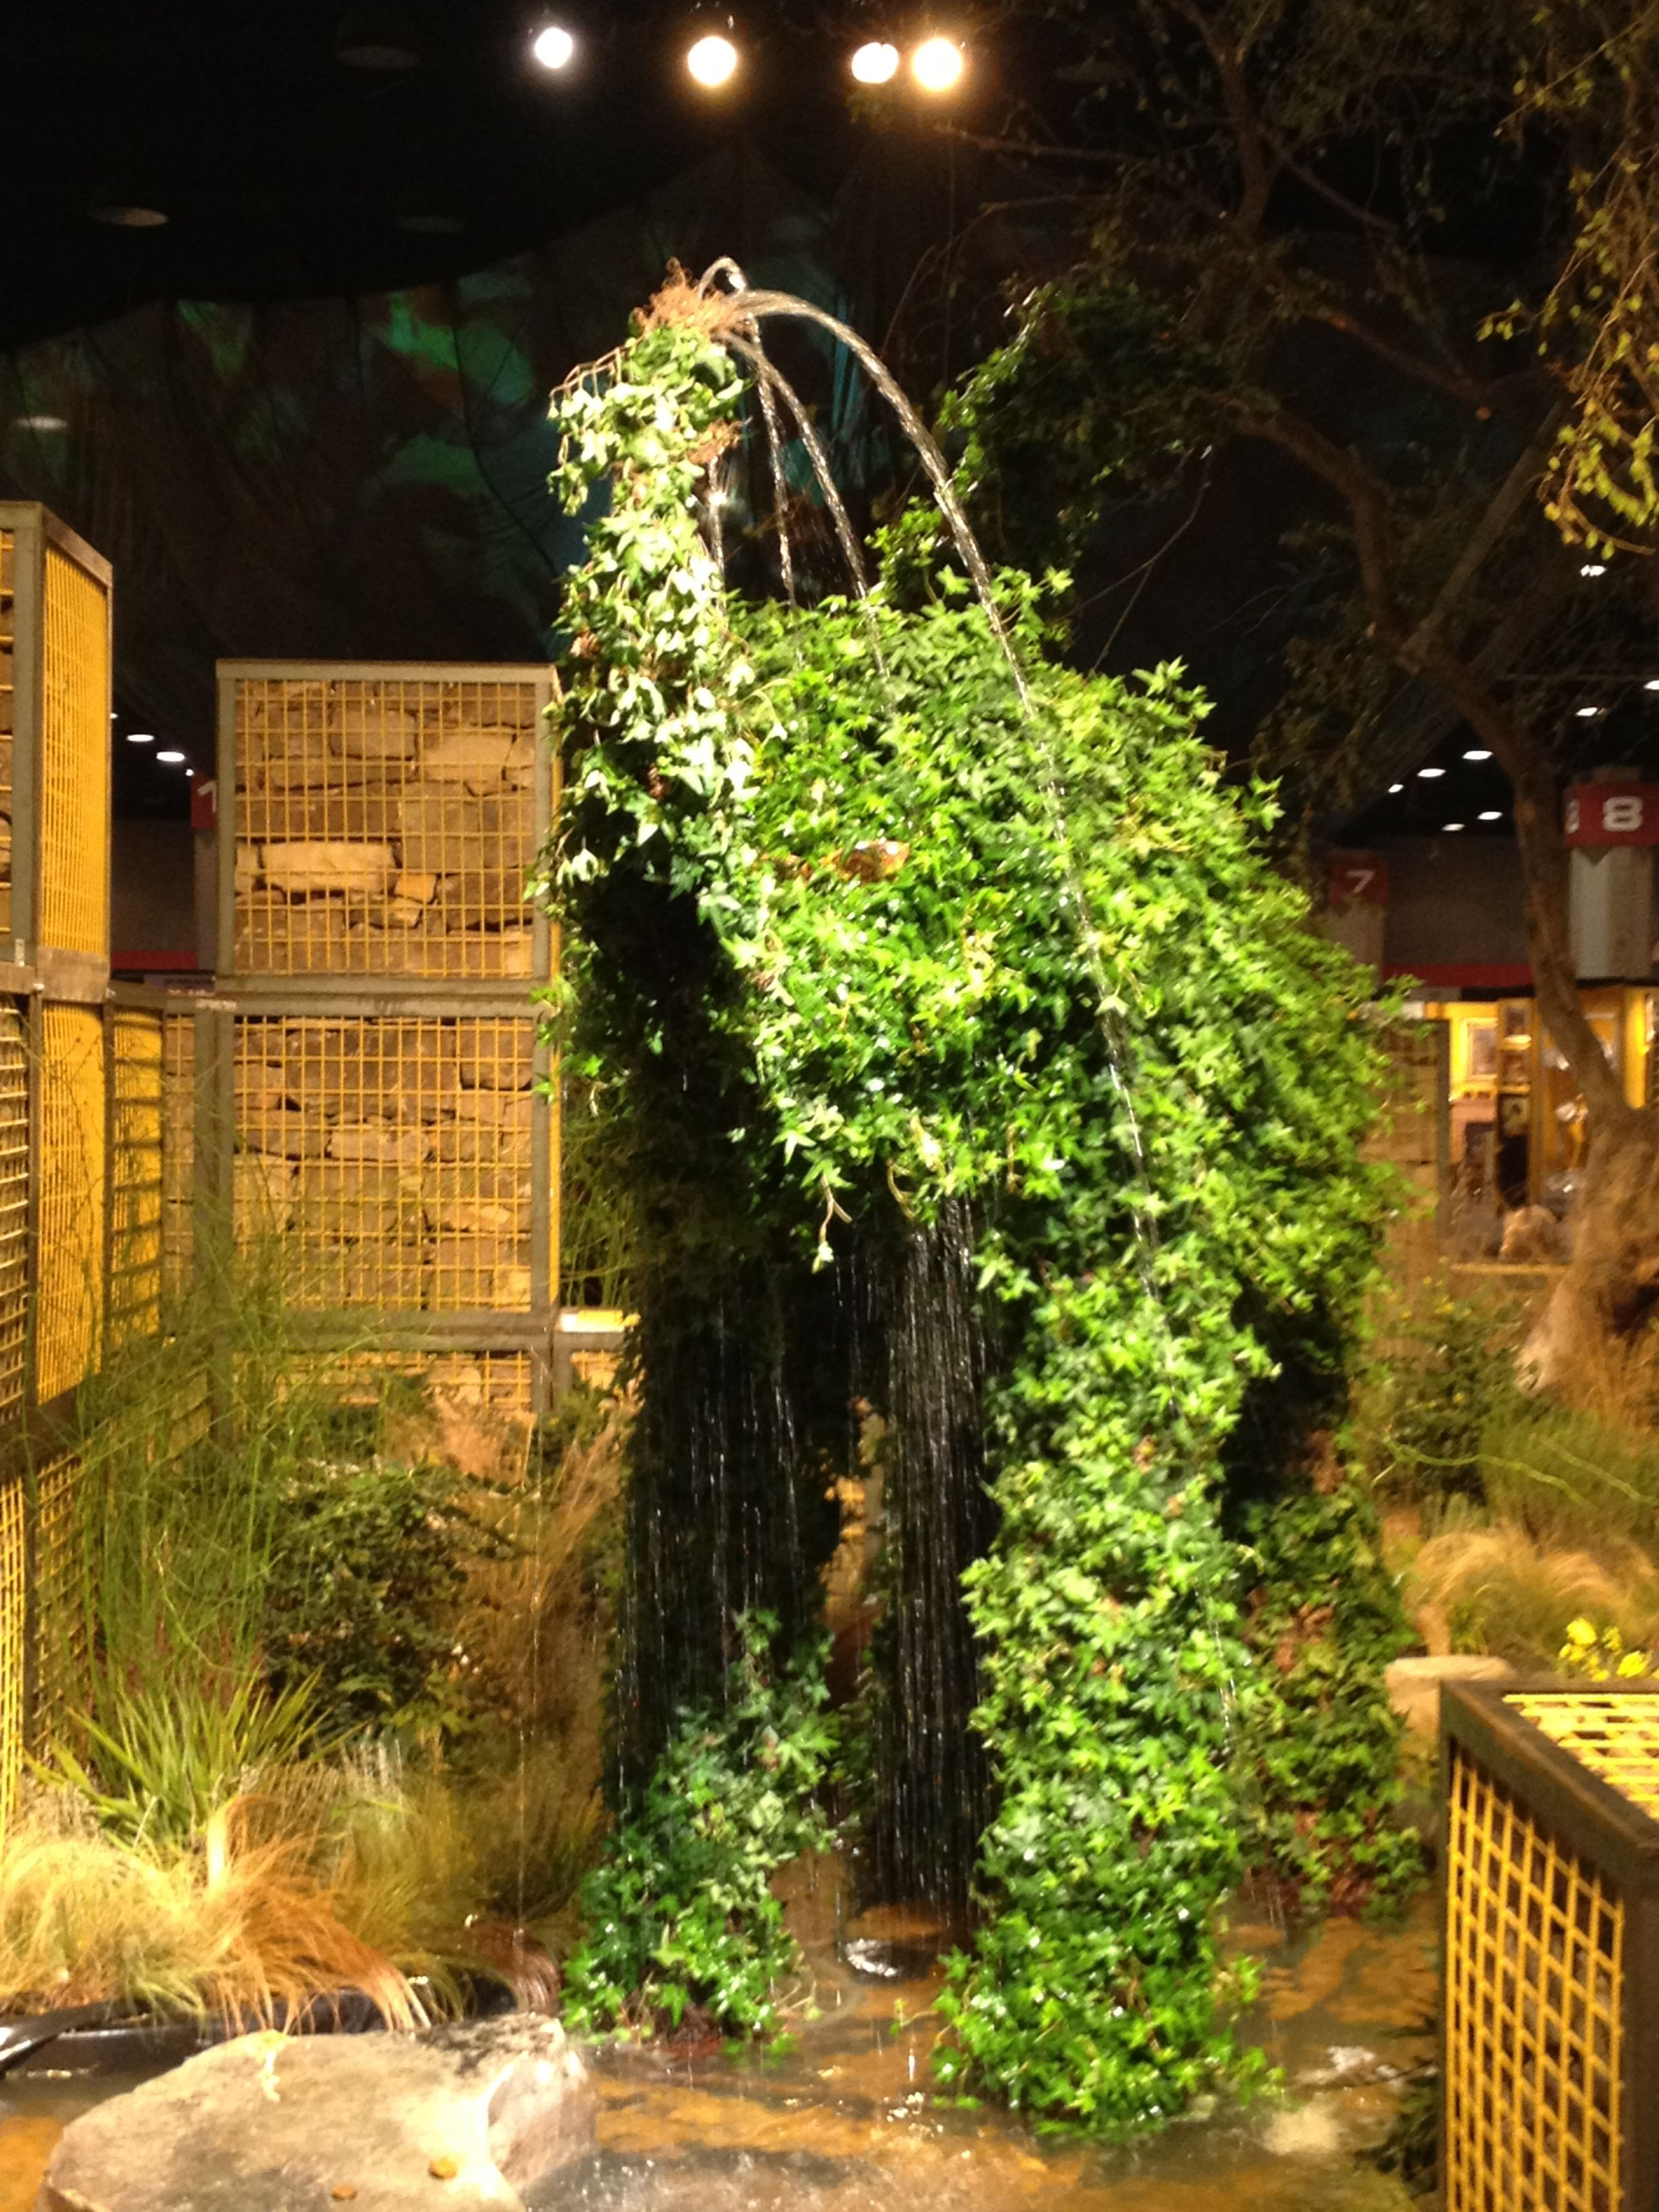 2013 nashville antiques and garden show events Nashville home and garden show